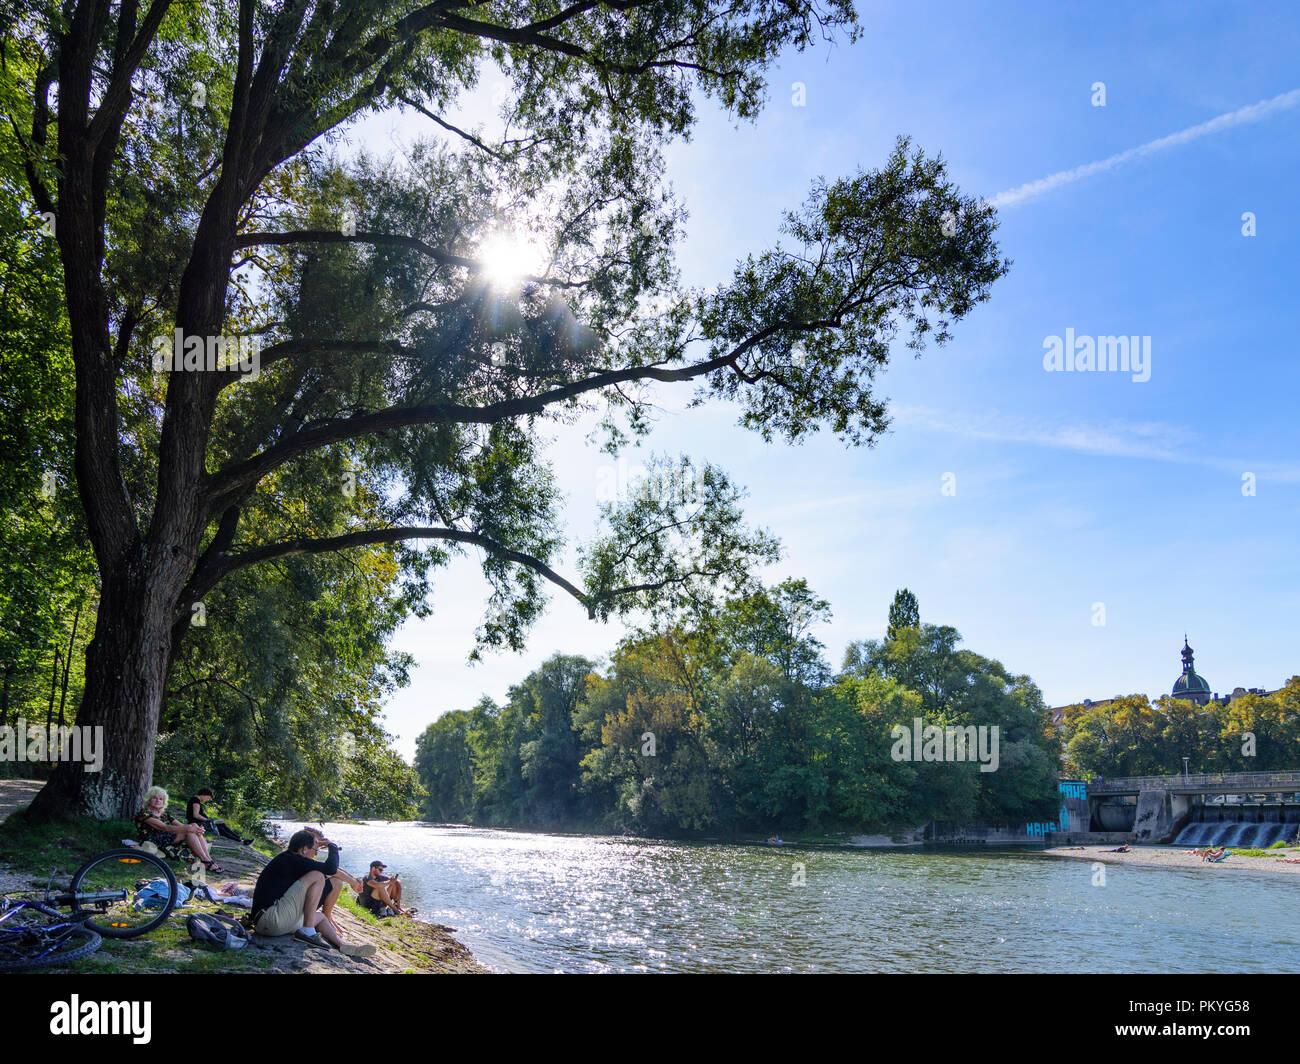 München, Munich: river Kleine Isar, talking people, sunbather, Wehrsteg, Oberbayern, Upper Bavaria, Bayern, Bavaria, Germany - Stock Image